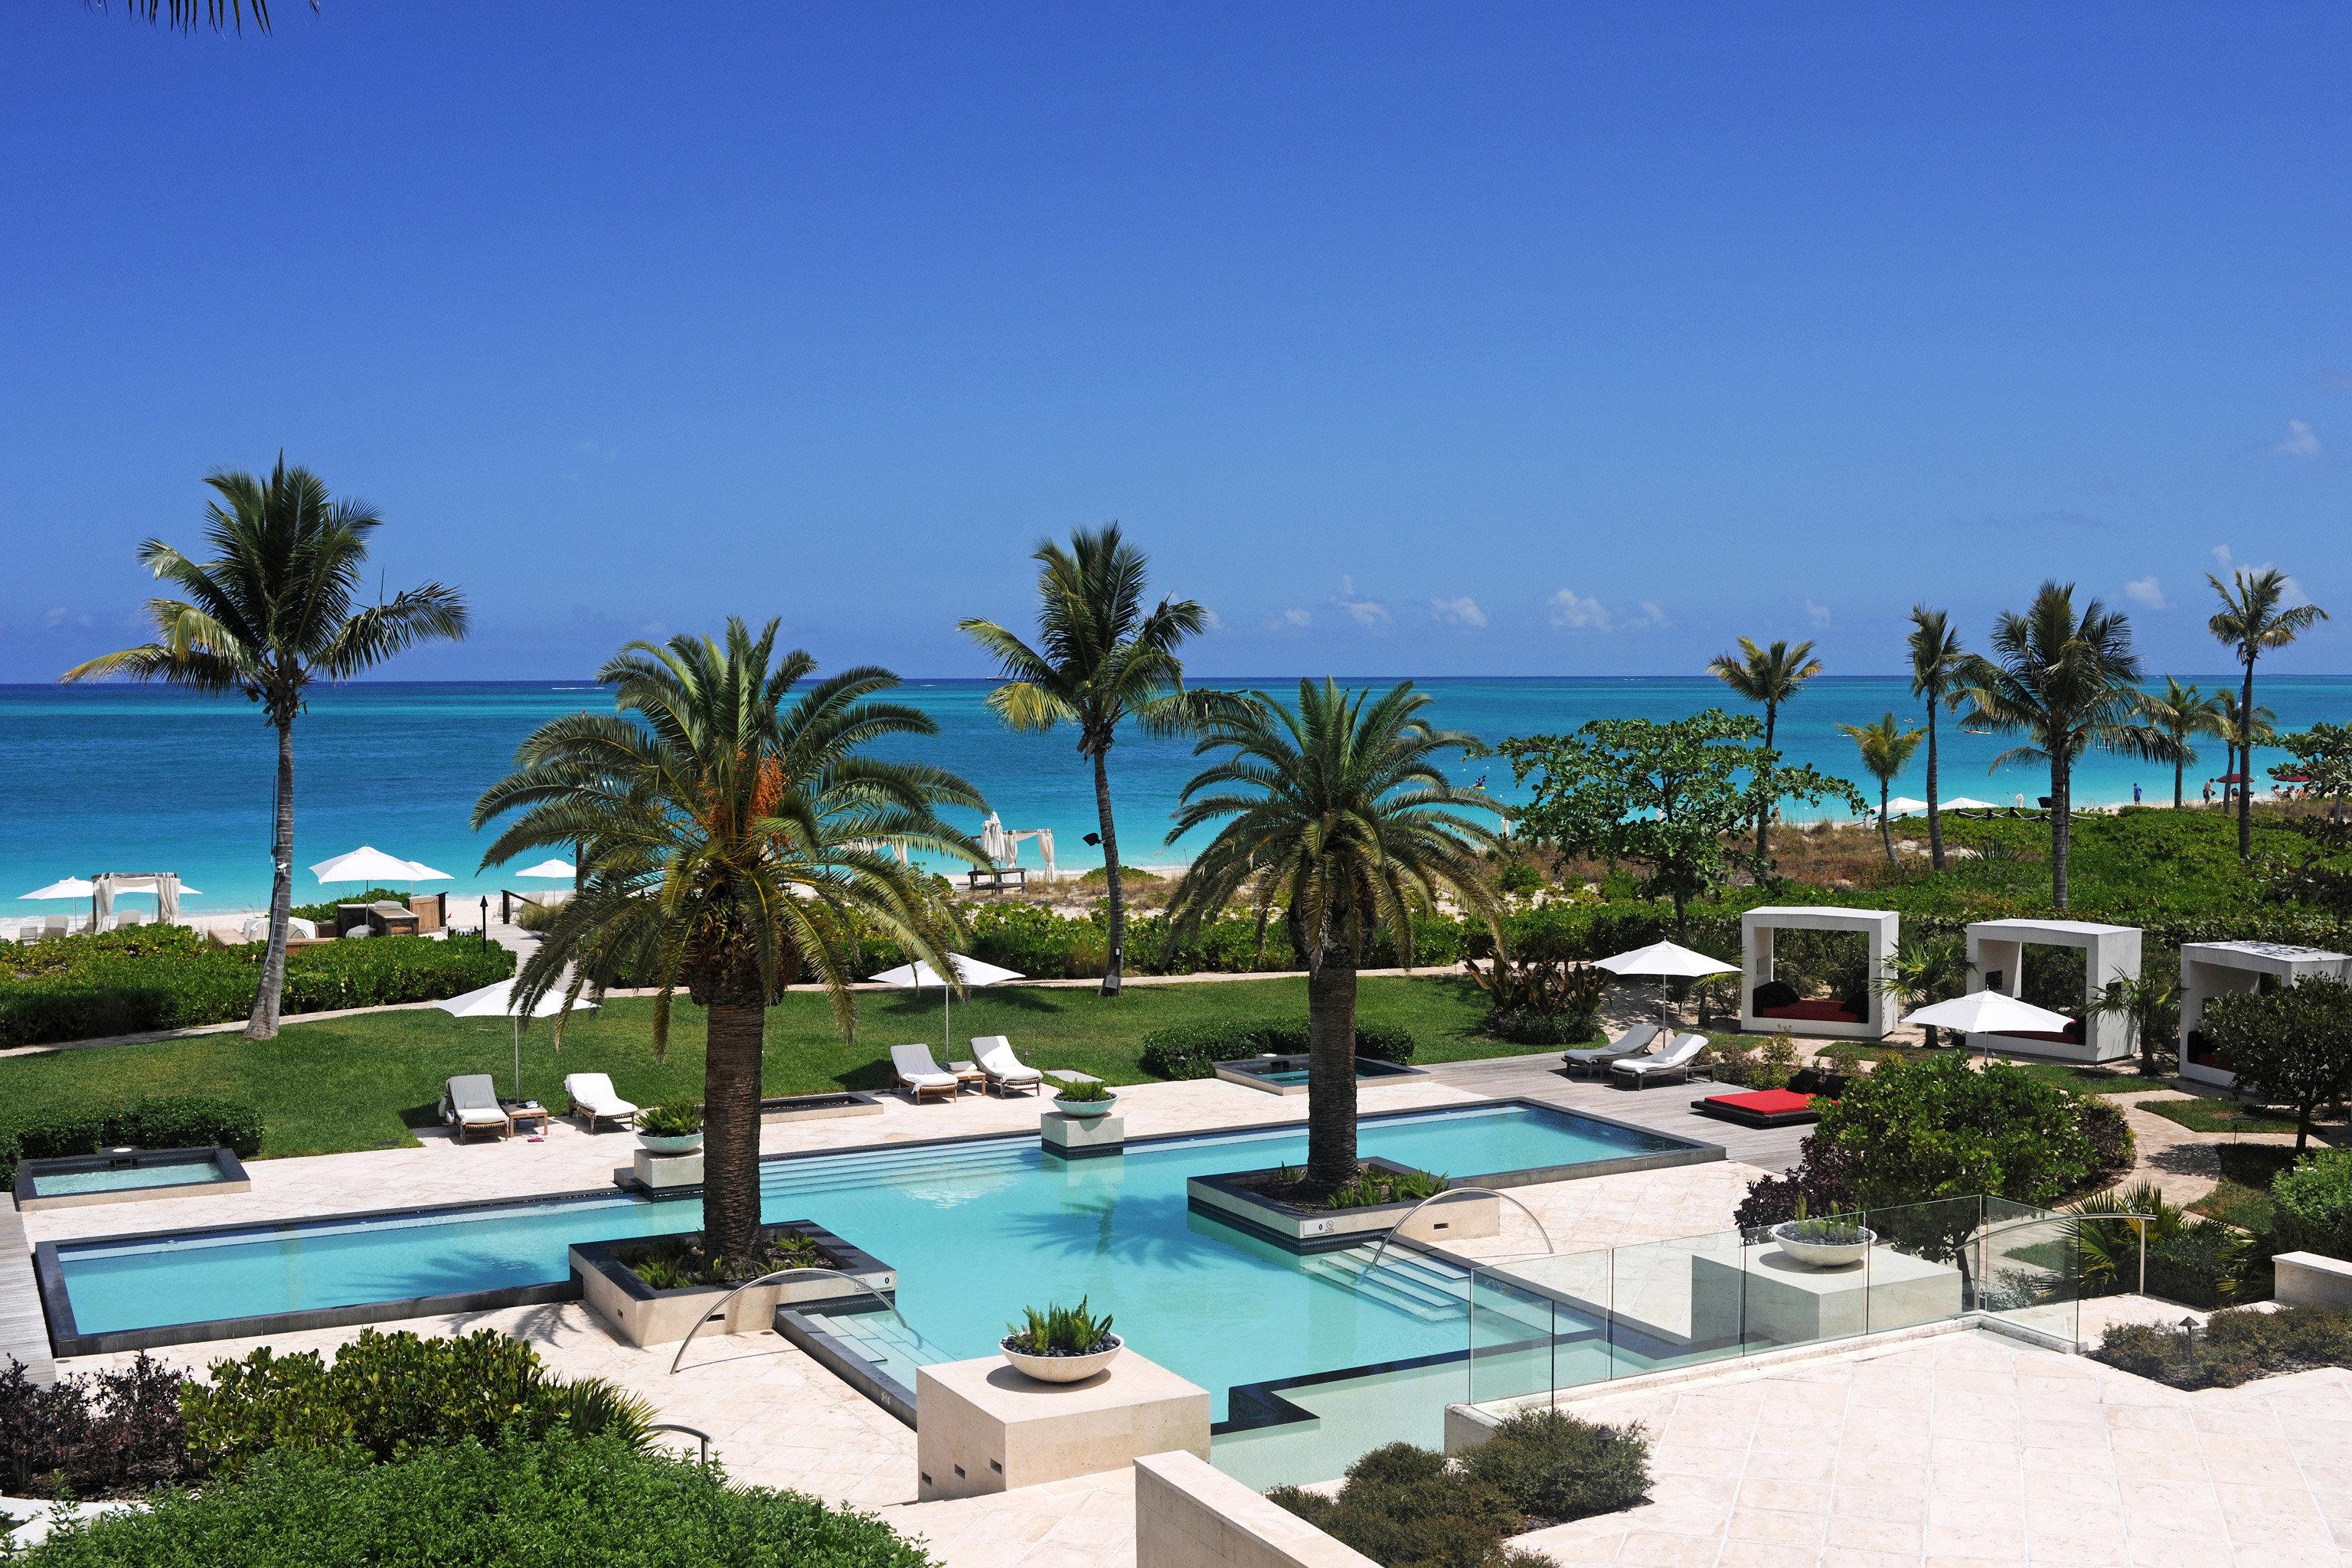 tree sky property Resort palm swimming pool leisure Villa condominium lawn caribbean Pool arecales marina plant shade Garden sandy